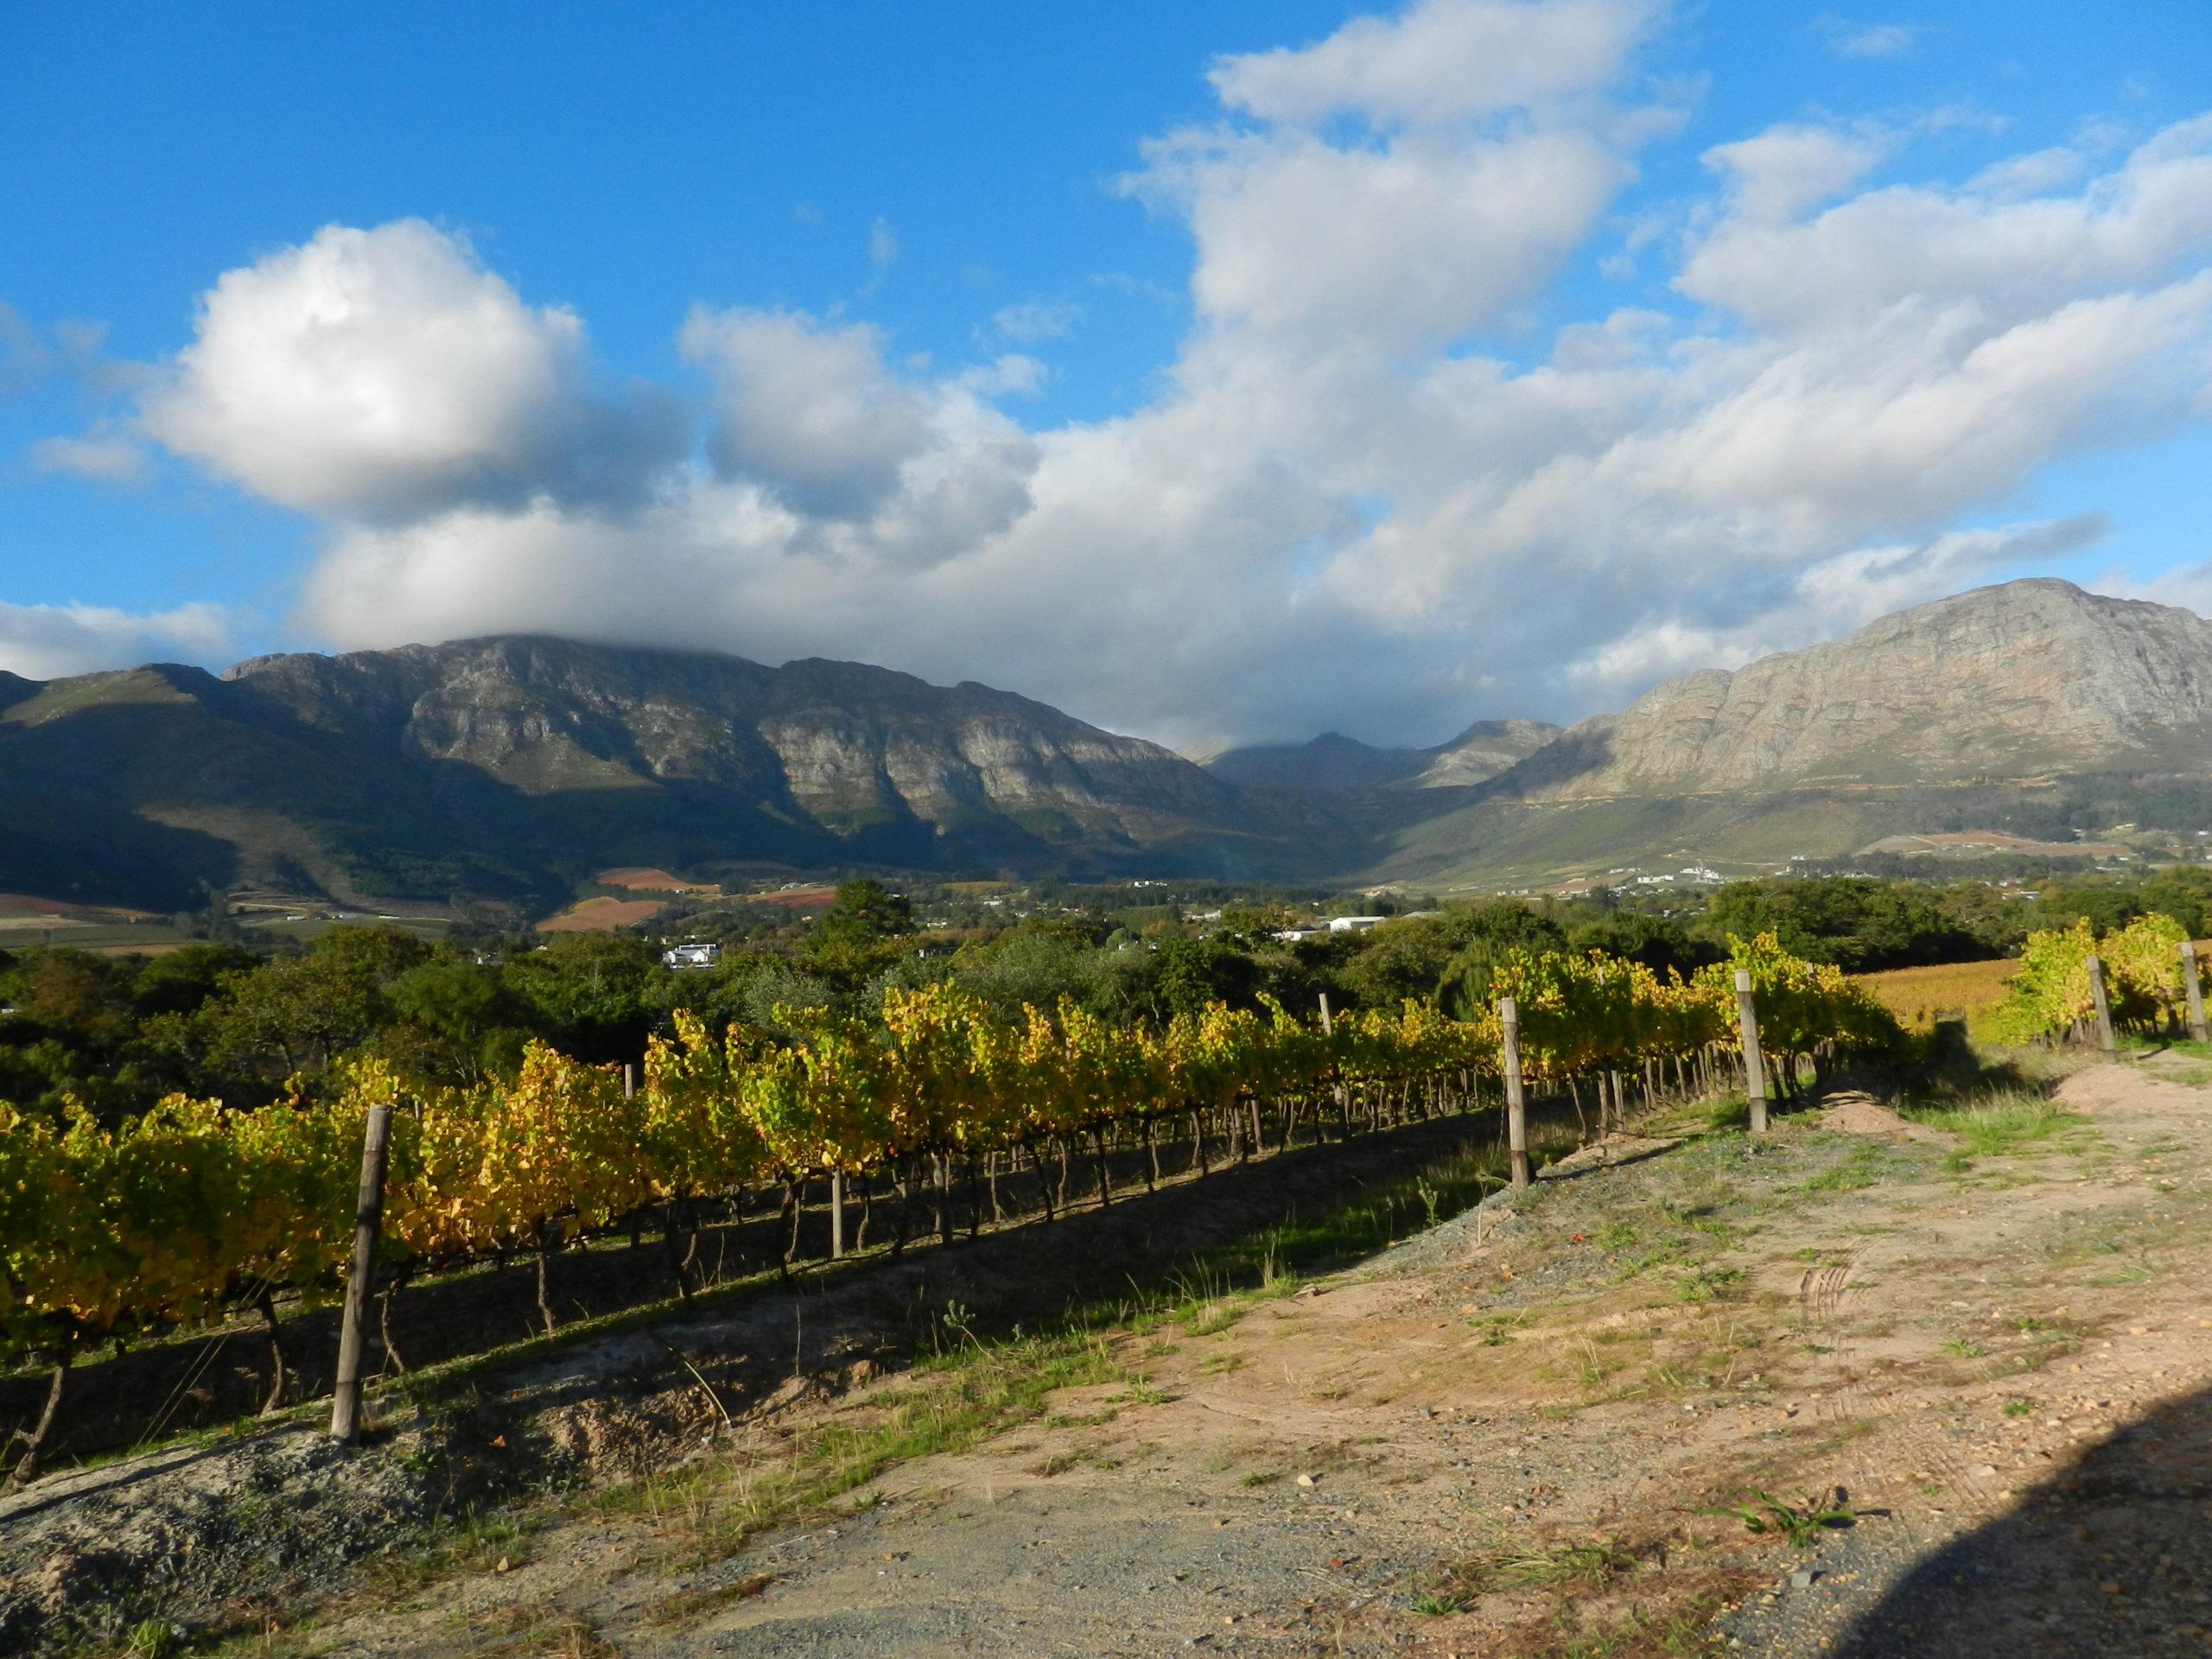 Beautiful view of the vineyards in Franschhoek valley